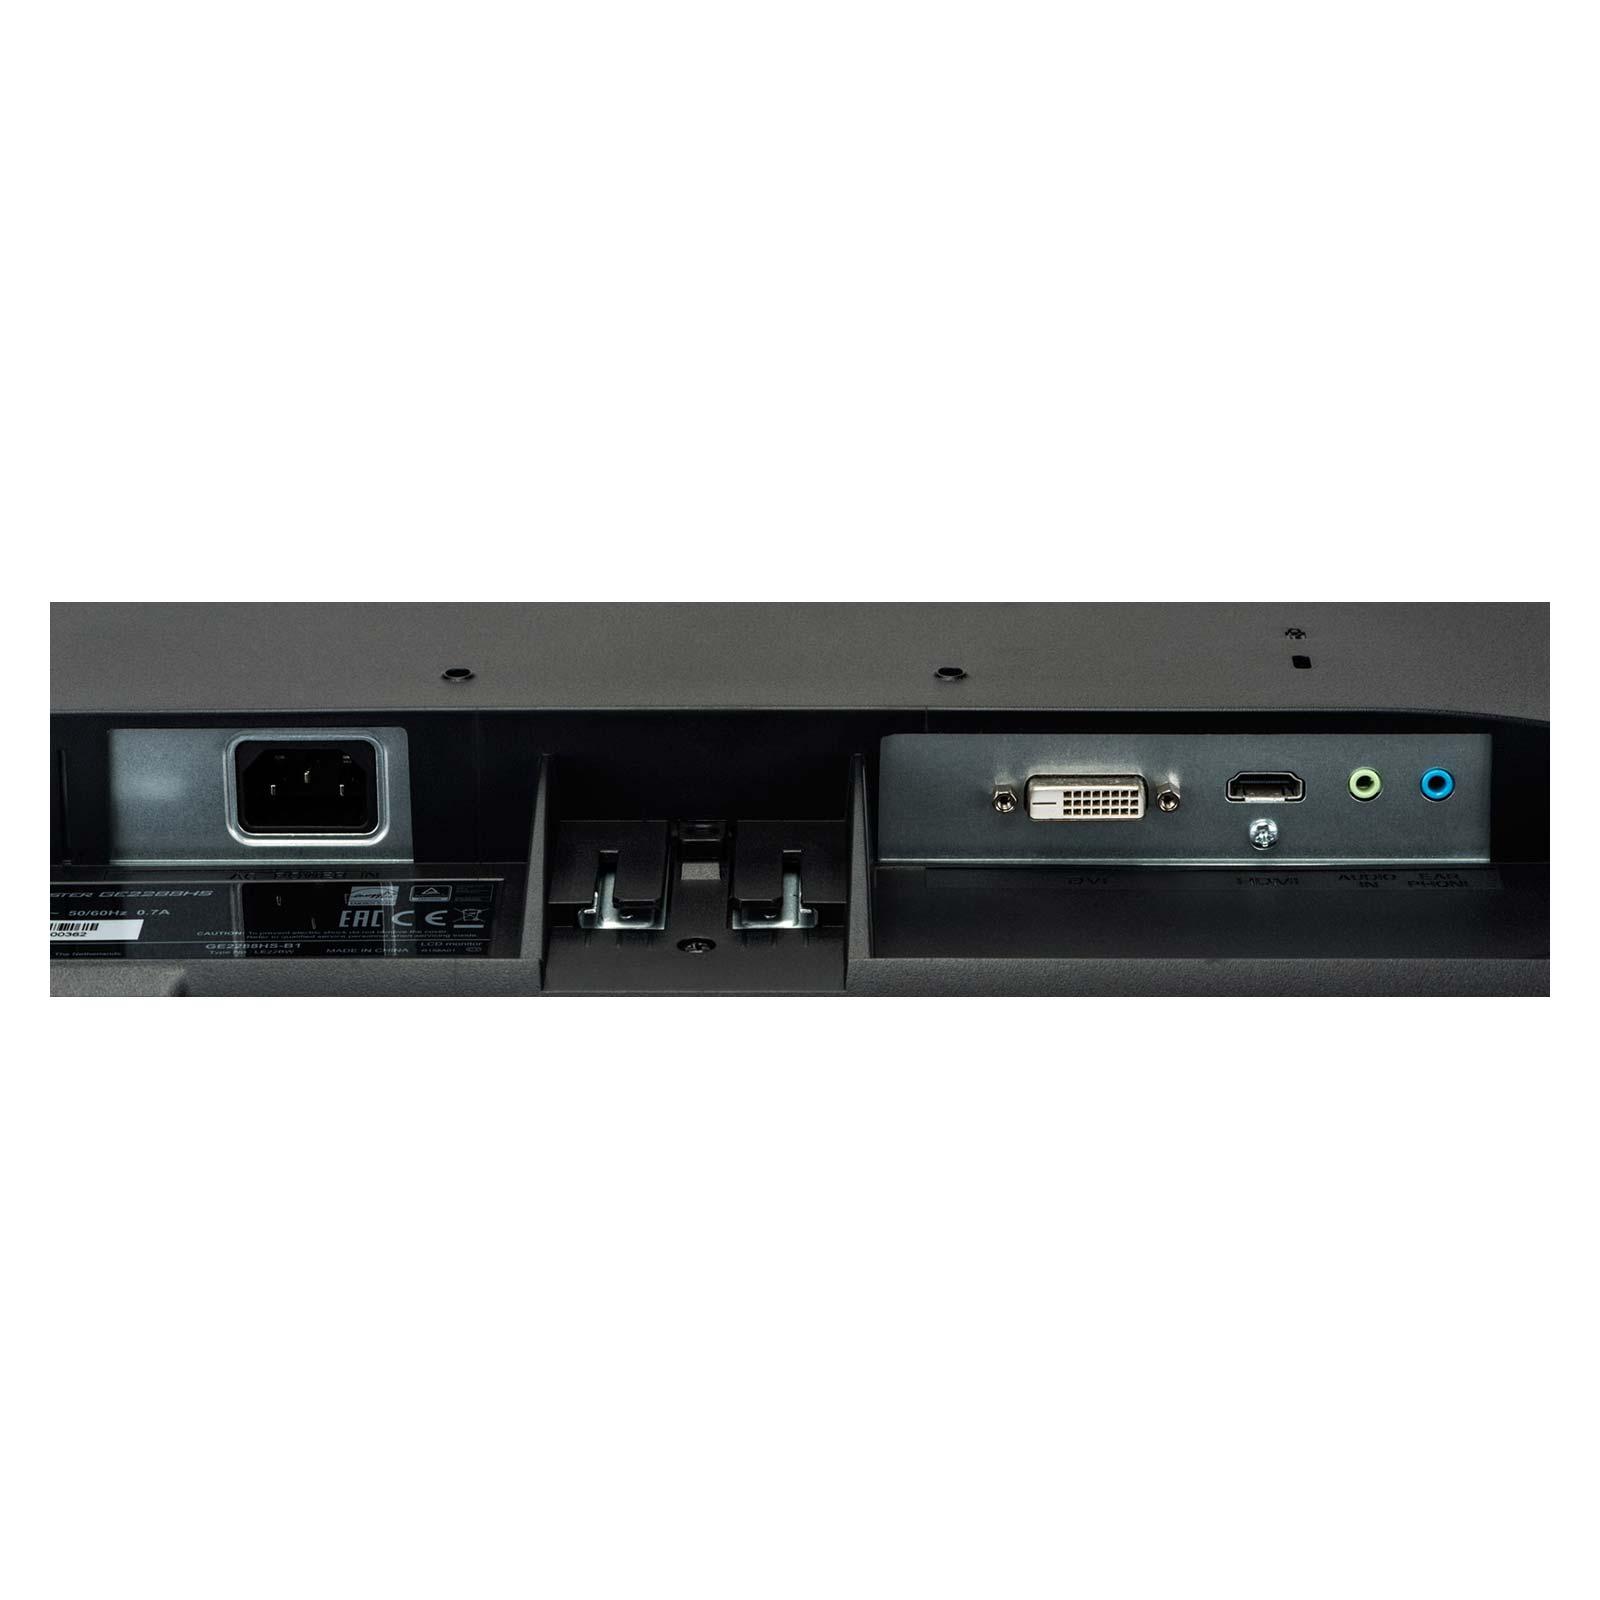 Iiyama GE2288HS-B1 G-Master Black Hawk (GE2288HS-B1) - Achat / Vente Ecran PC sur Cybertek.fr - 4